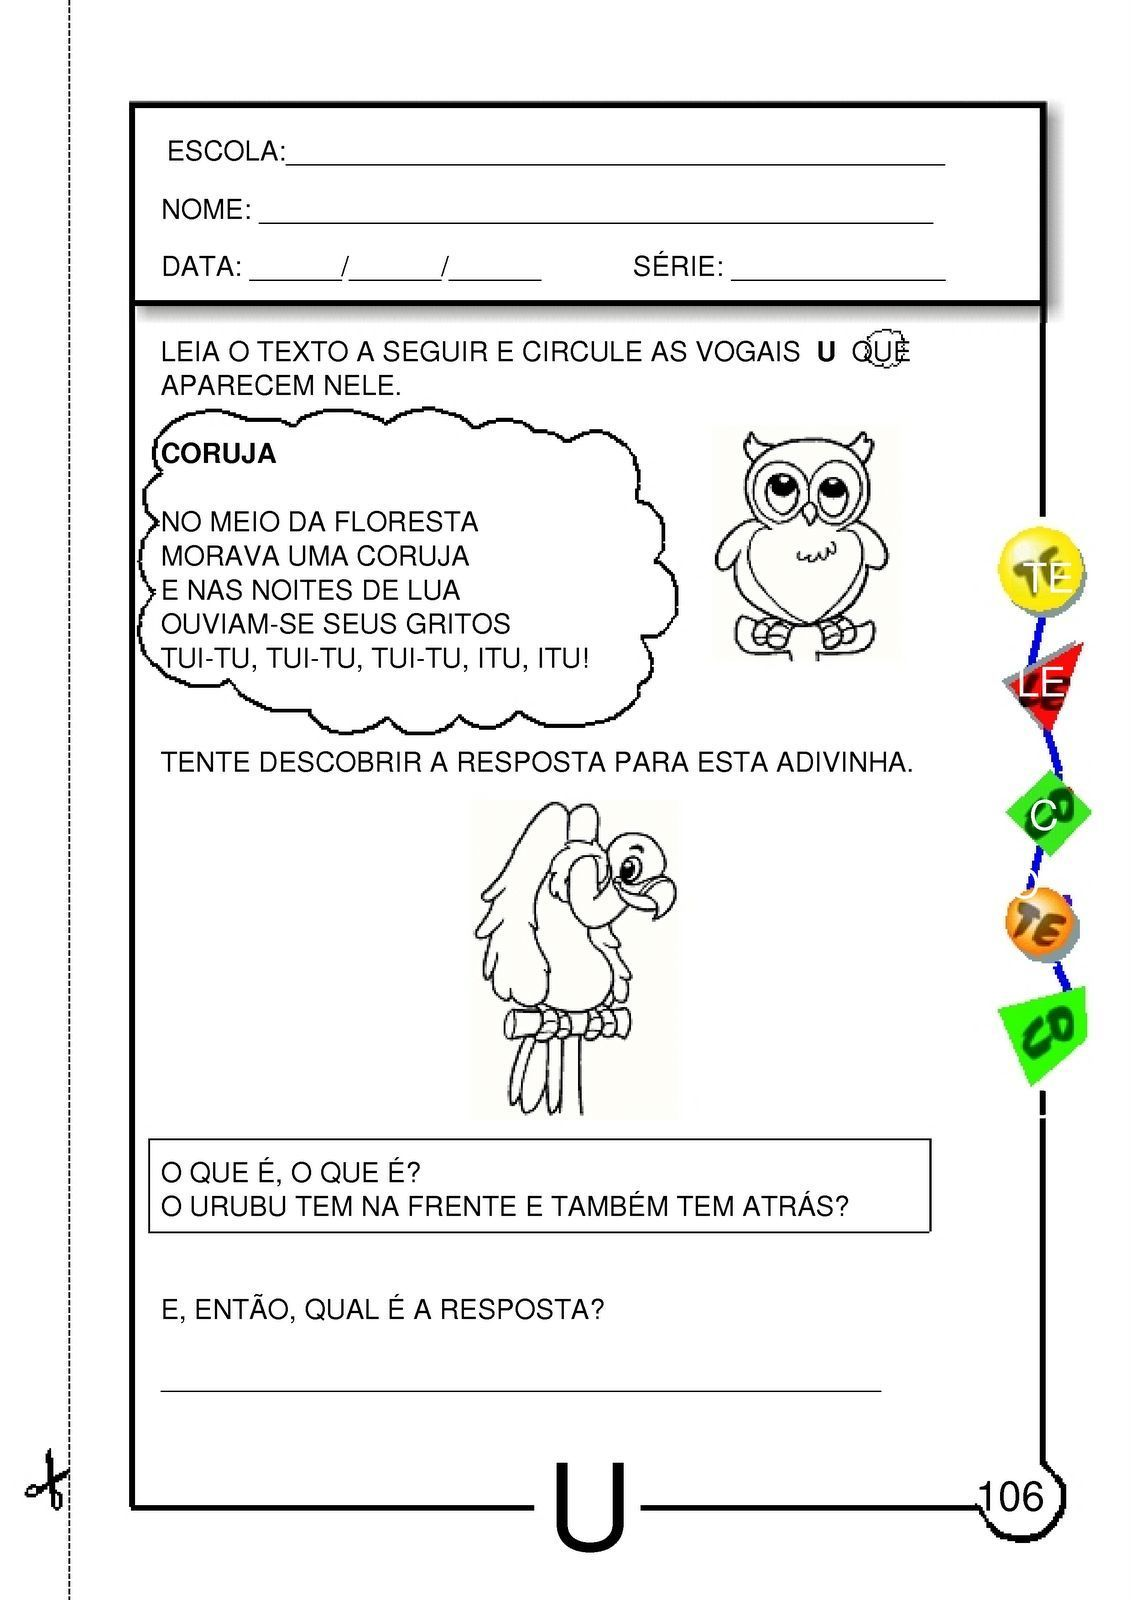 Apostila Educacao Infantil 4 Anos Para Baixar Gratis Educacao